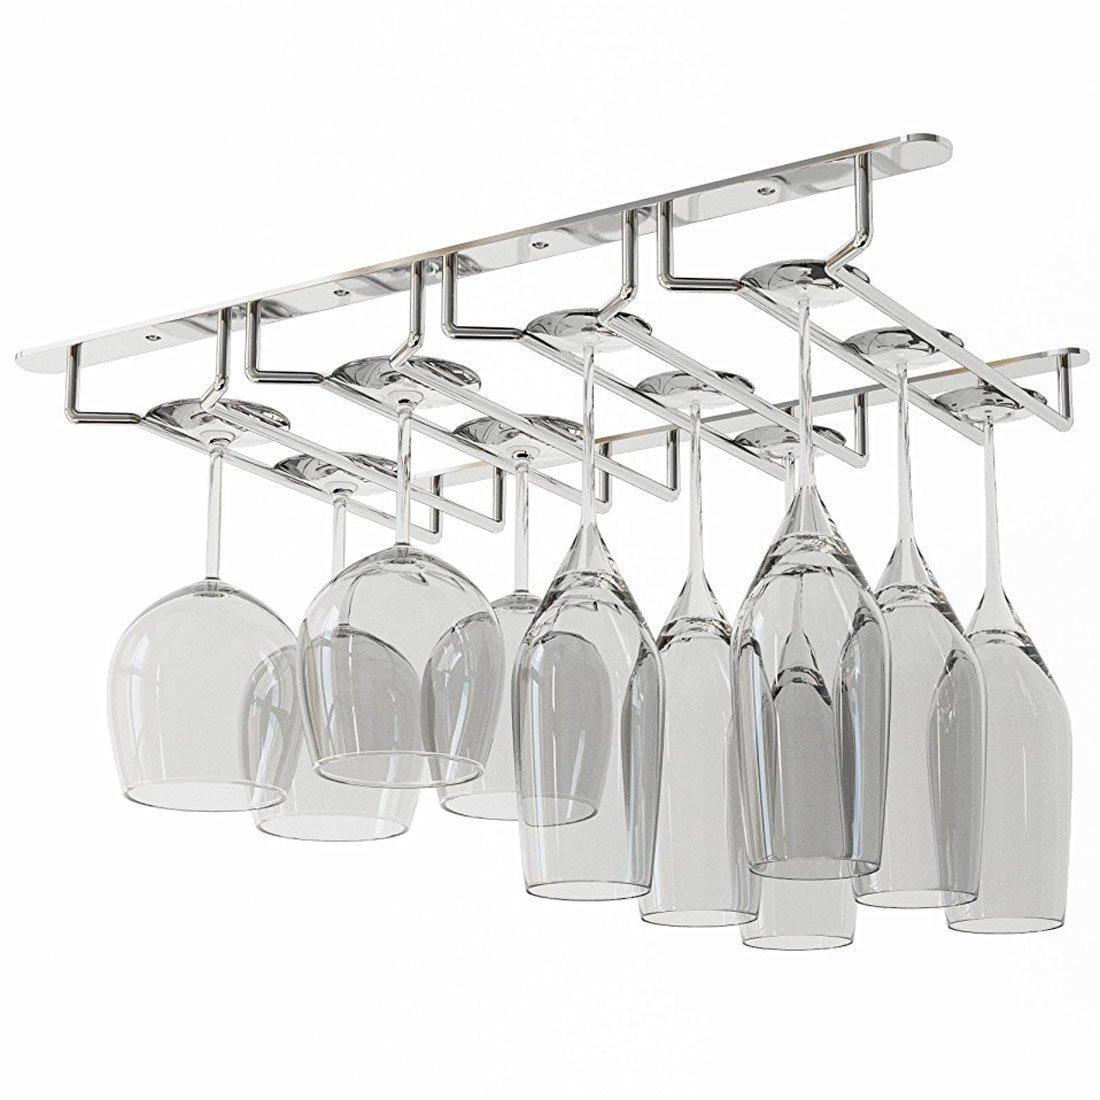 WALLNITURE Under Cabinet Stemware Glass Rack Wine Glasses Chrome Finish  product image